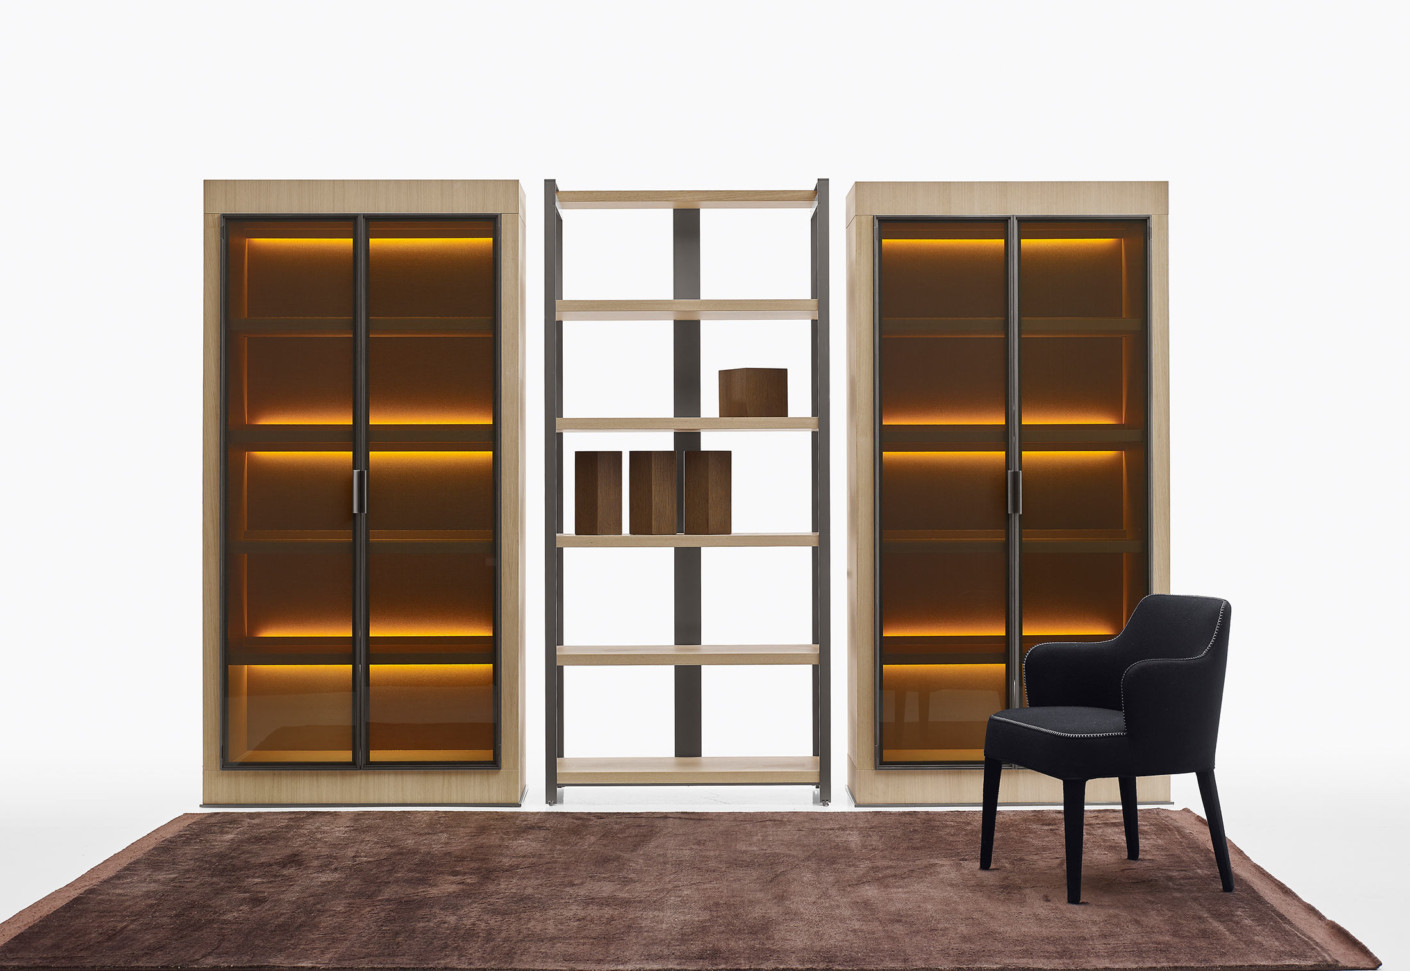 eracle schrank von maxalto stylepark. Black Bedroom Furniture Sets. Home Design Ideas